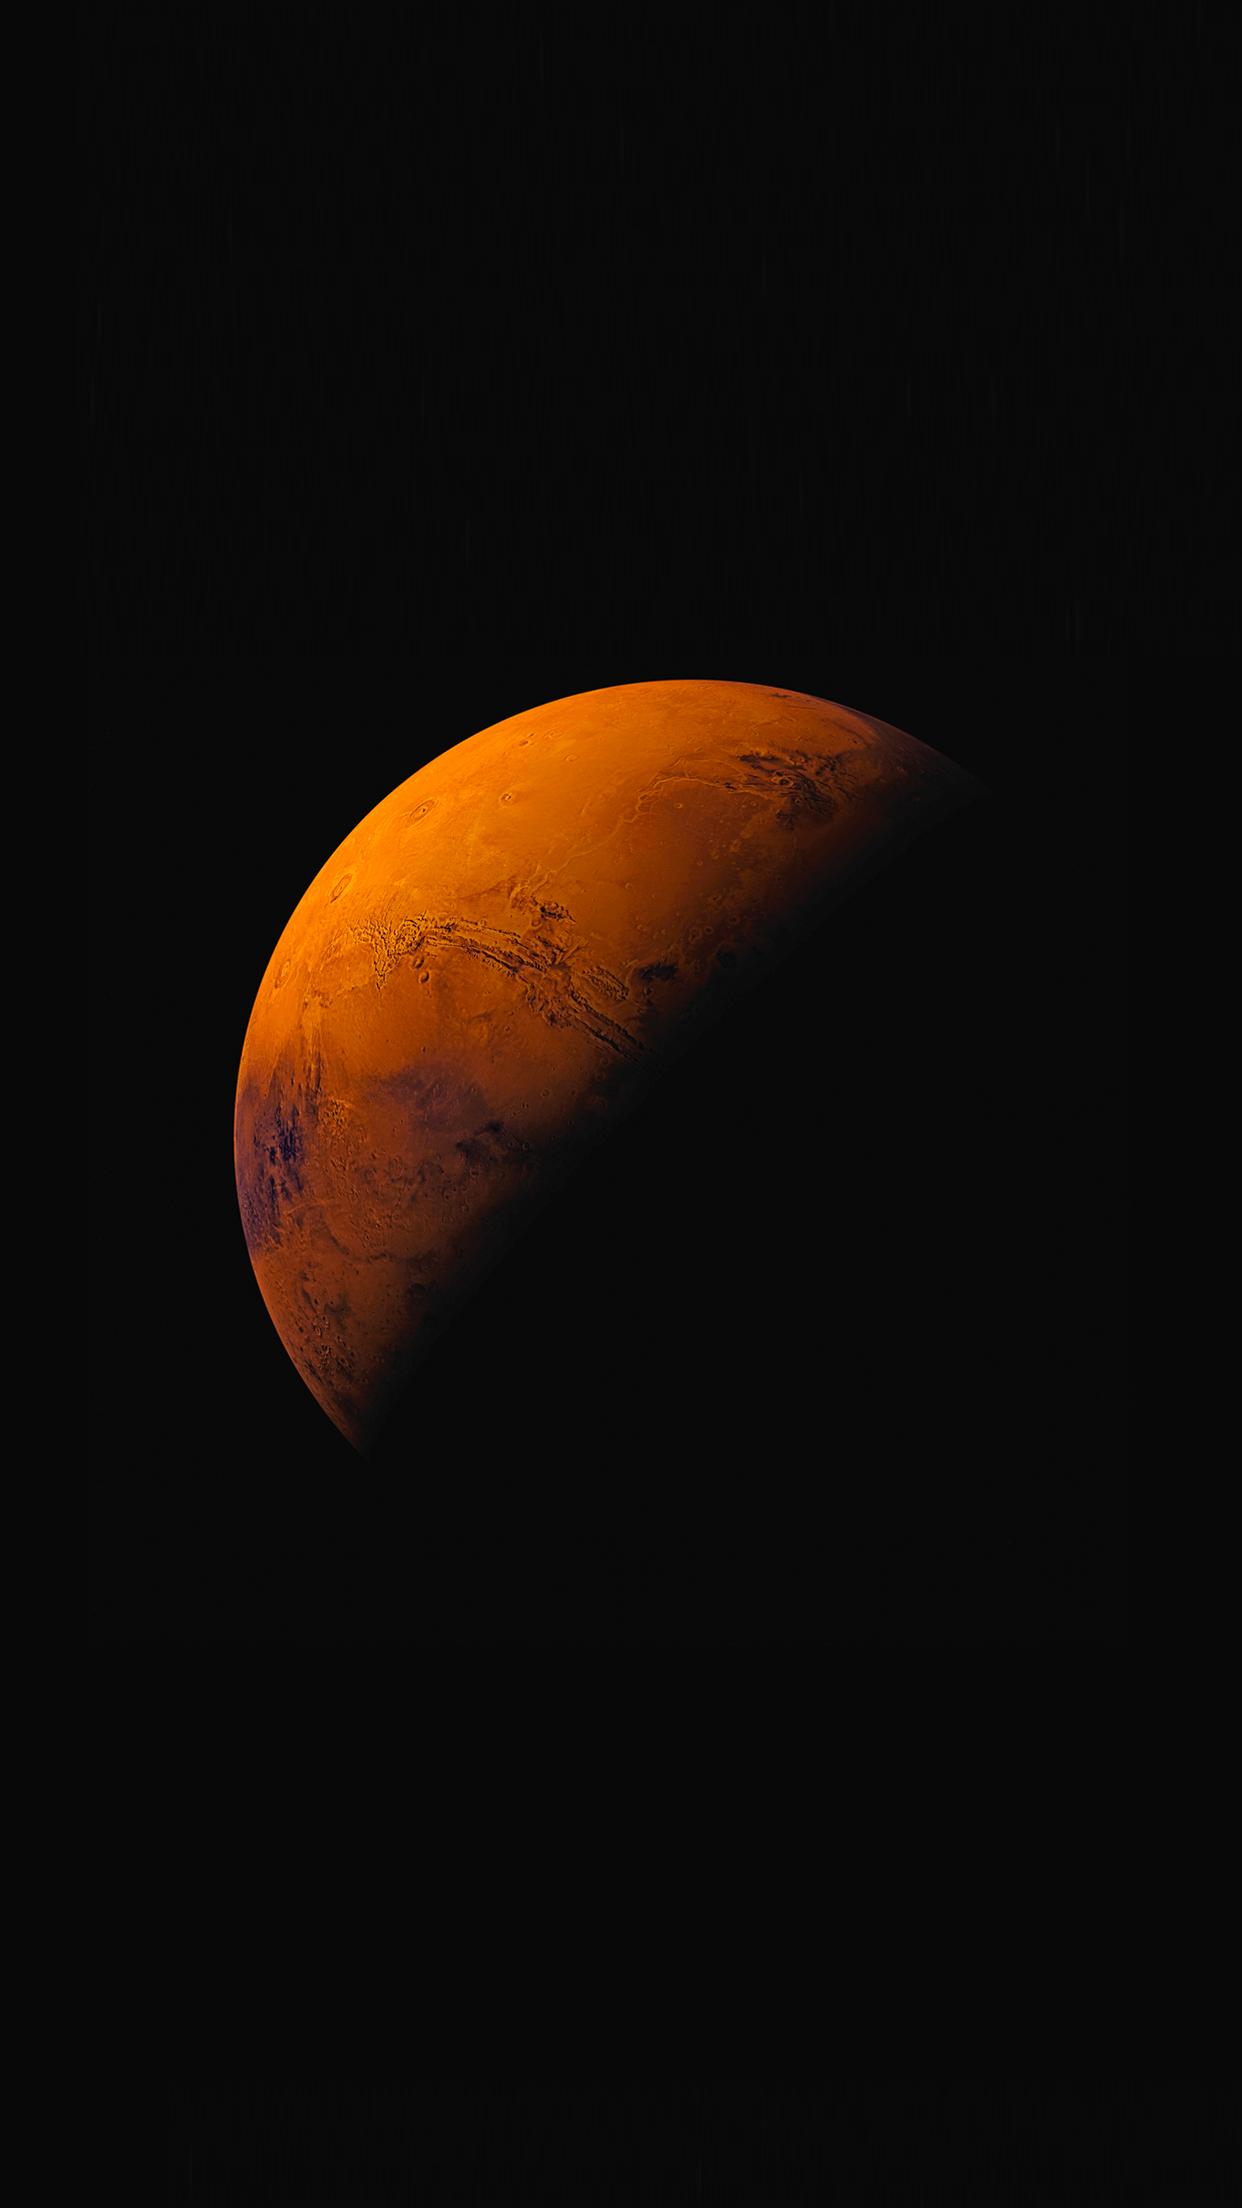 IOS 9 Orange Moon Wallpaper